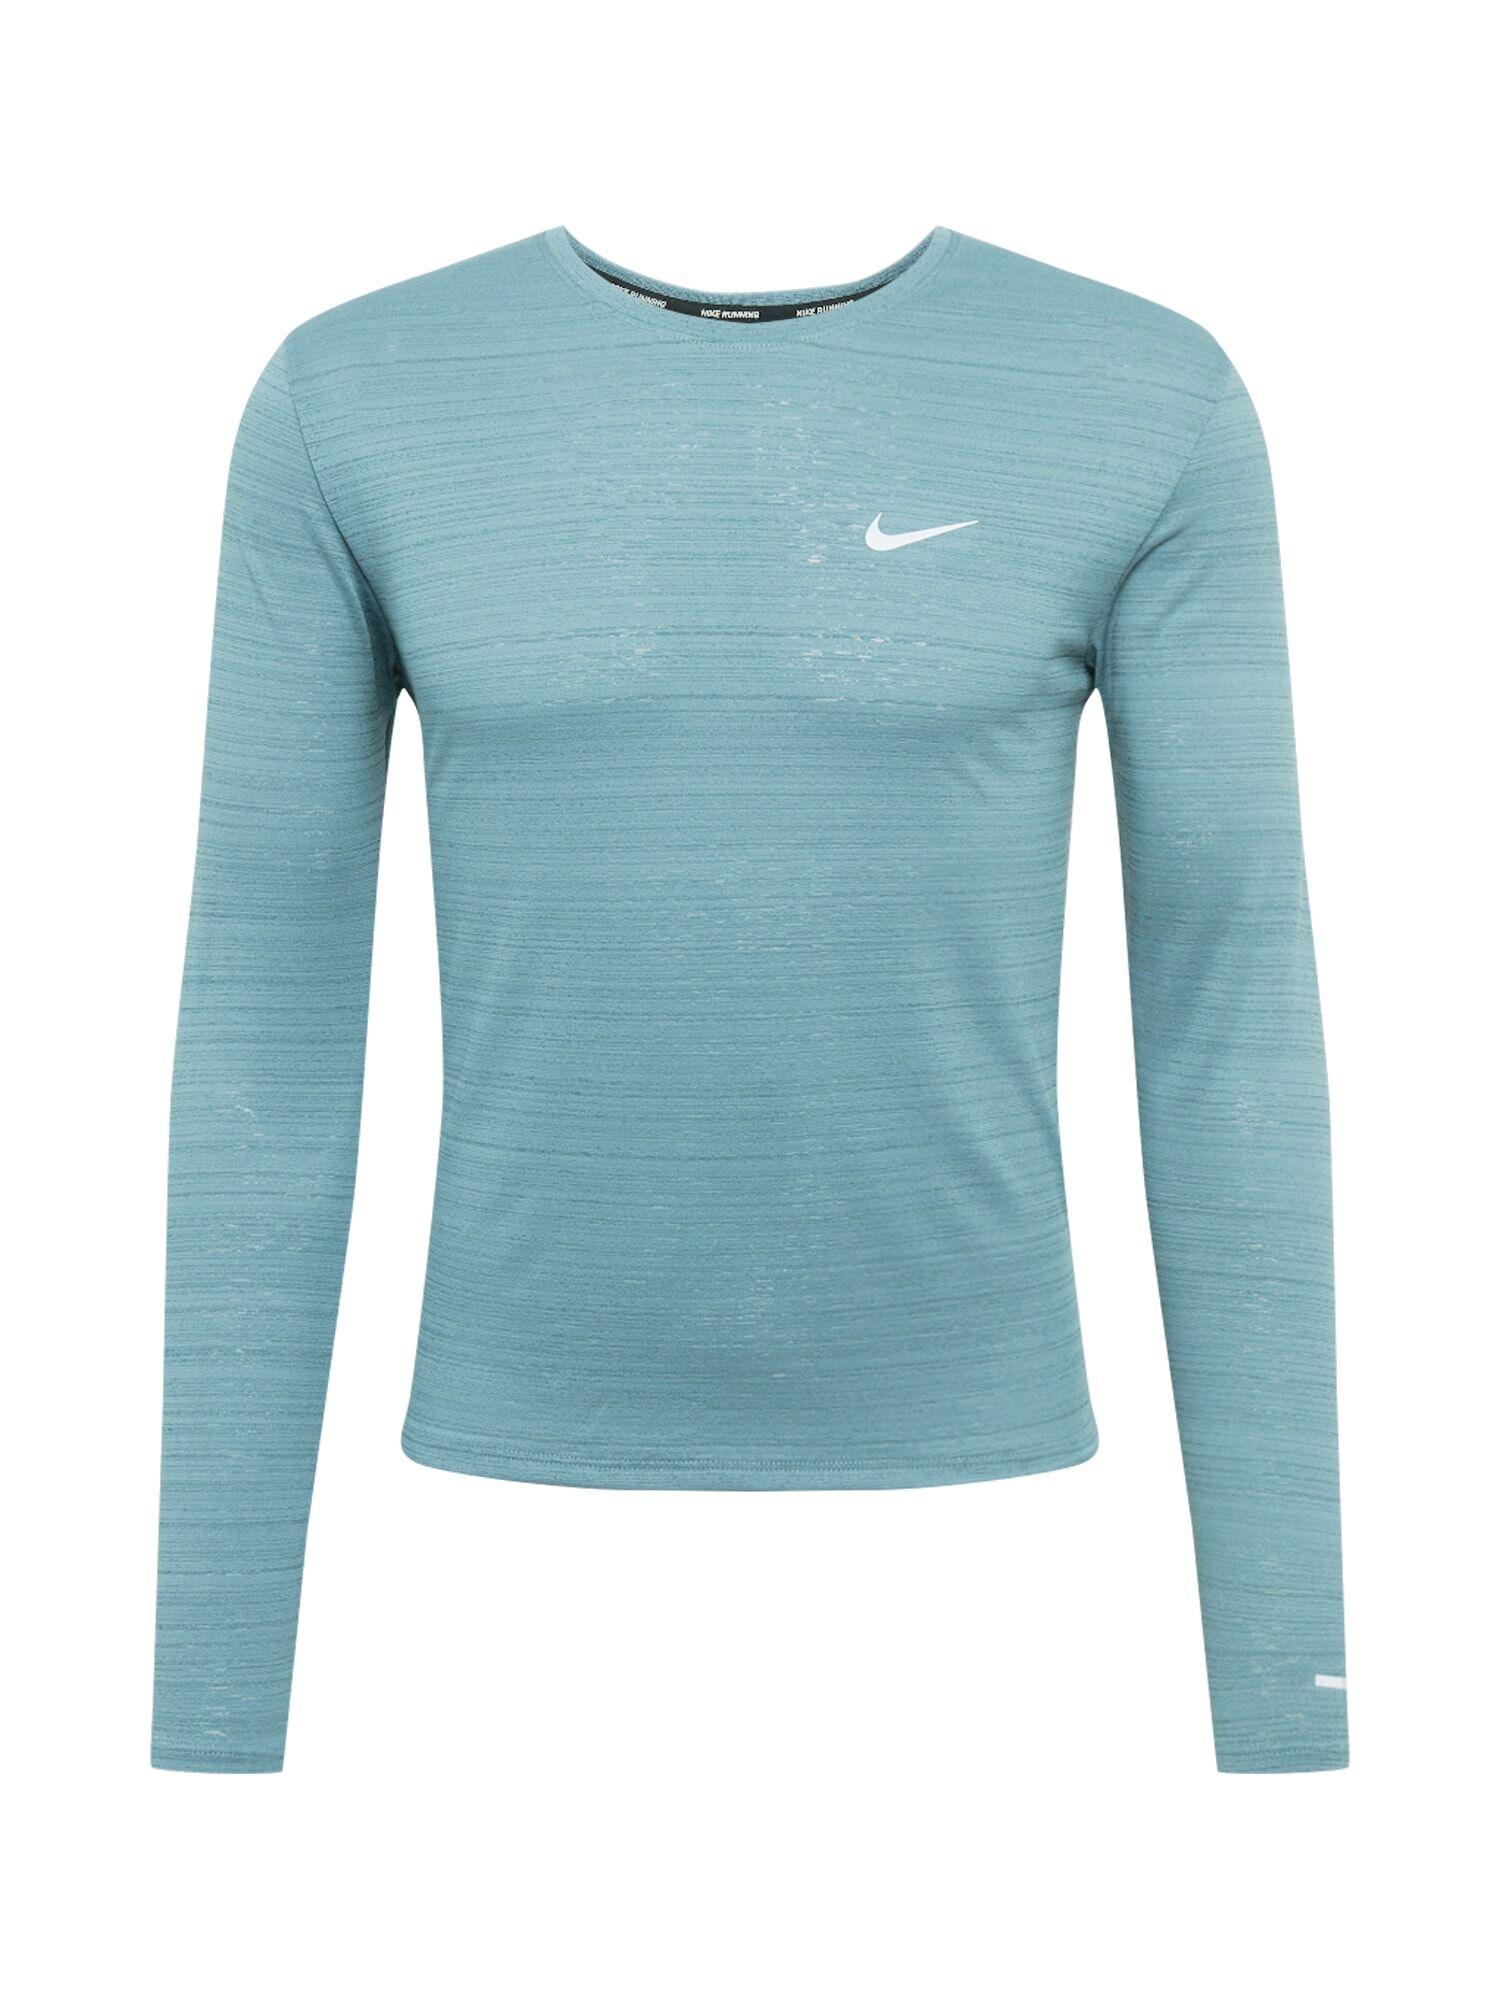 NIKE T-Shirt fonctionnel 'Miler'  - Bleu - Taille: XL - male